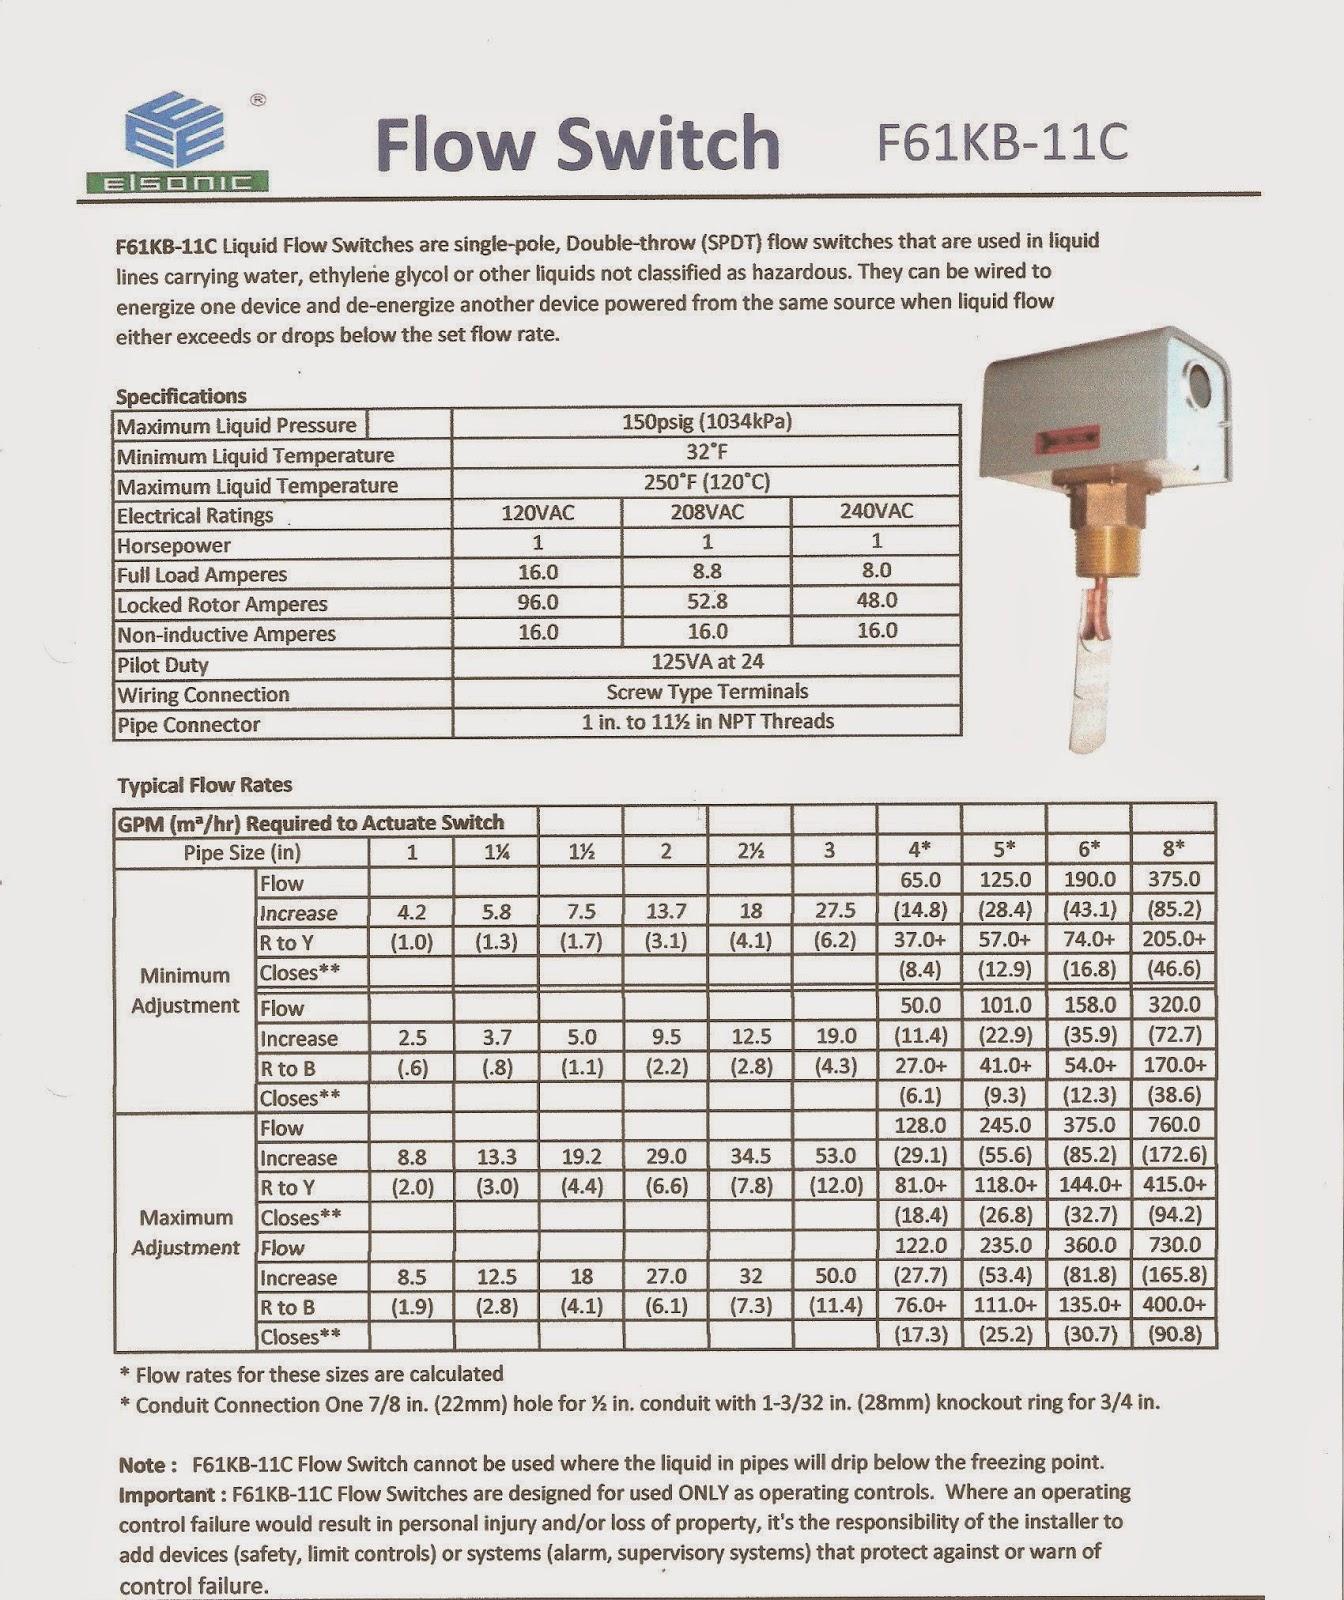 Flow Switch Diagram 110 - Car Fuse Box Wiring Diagram •